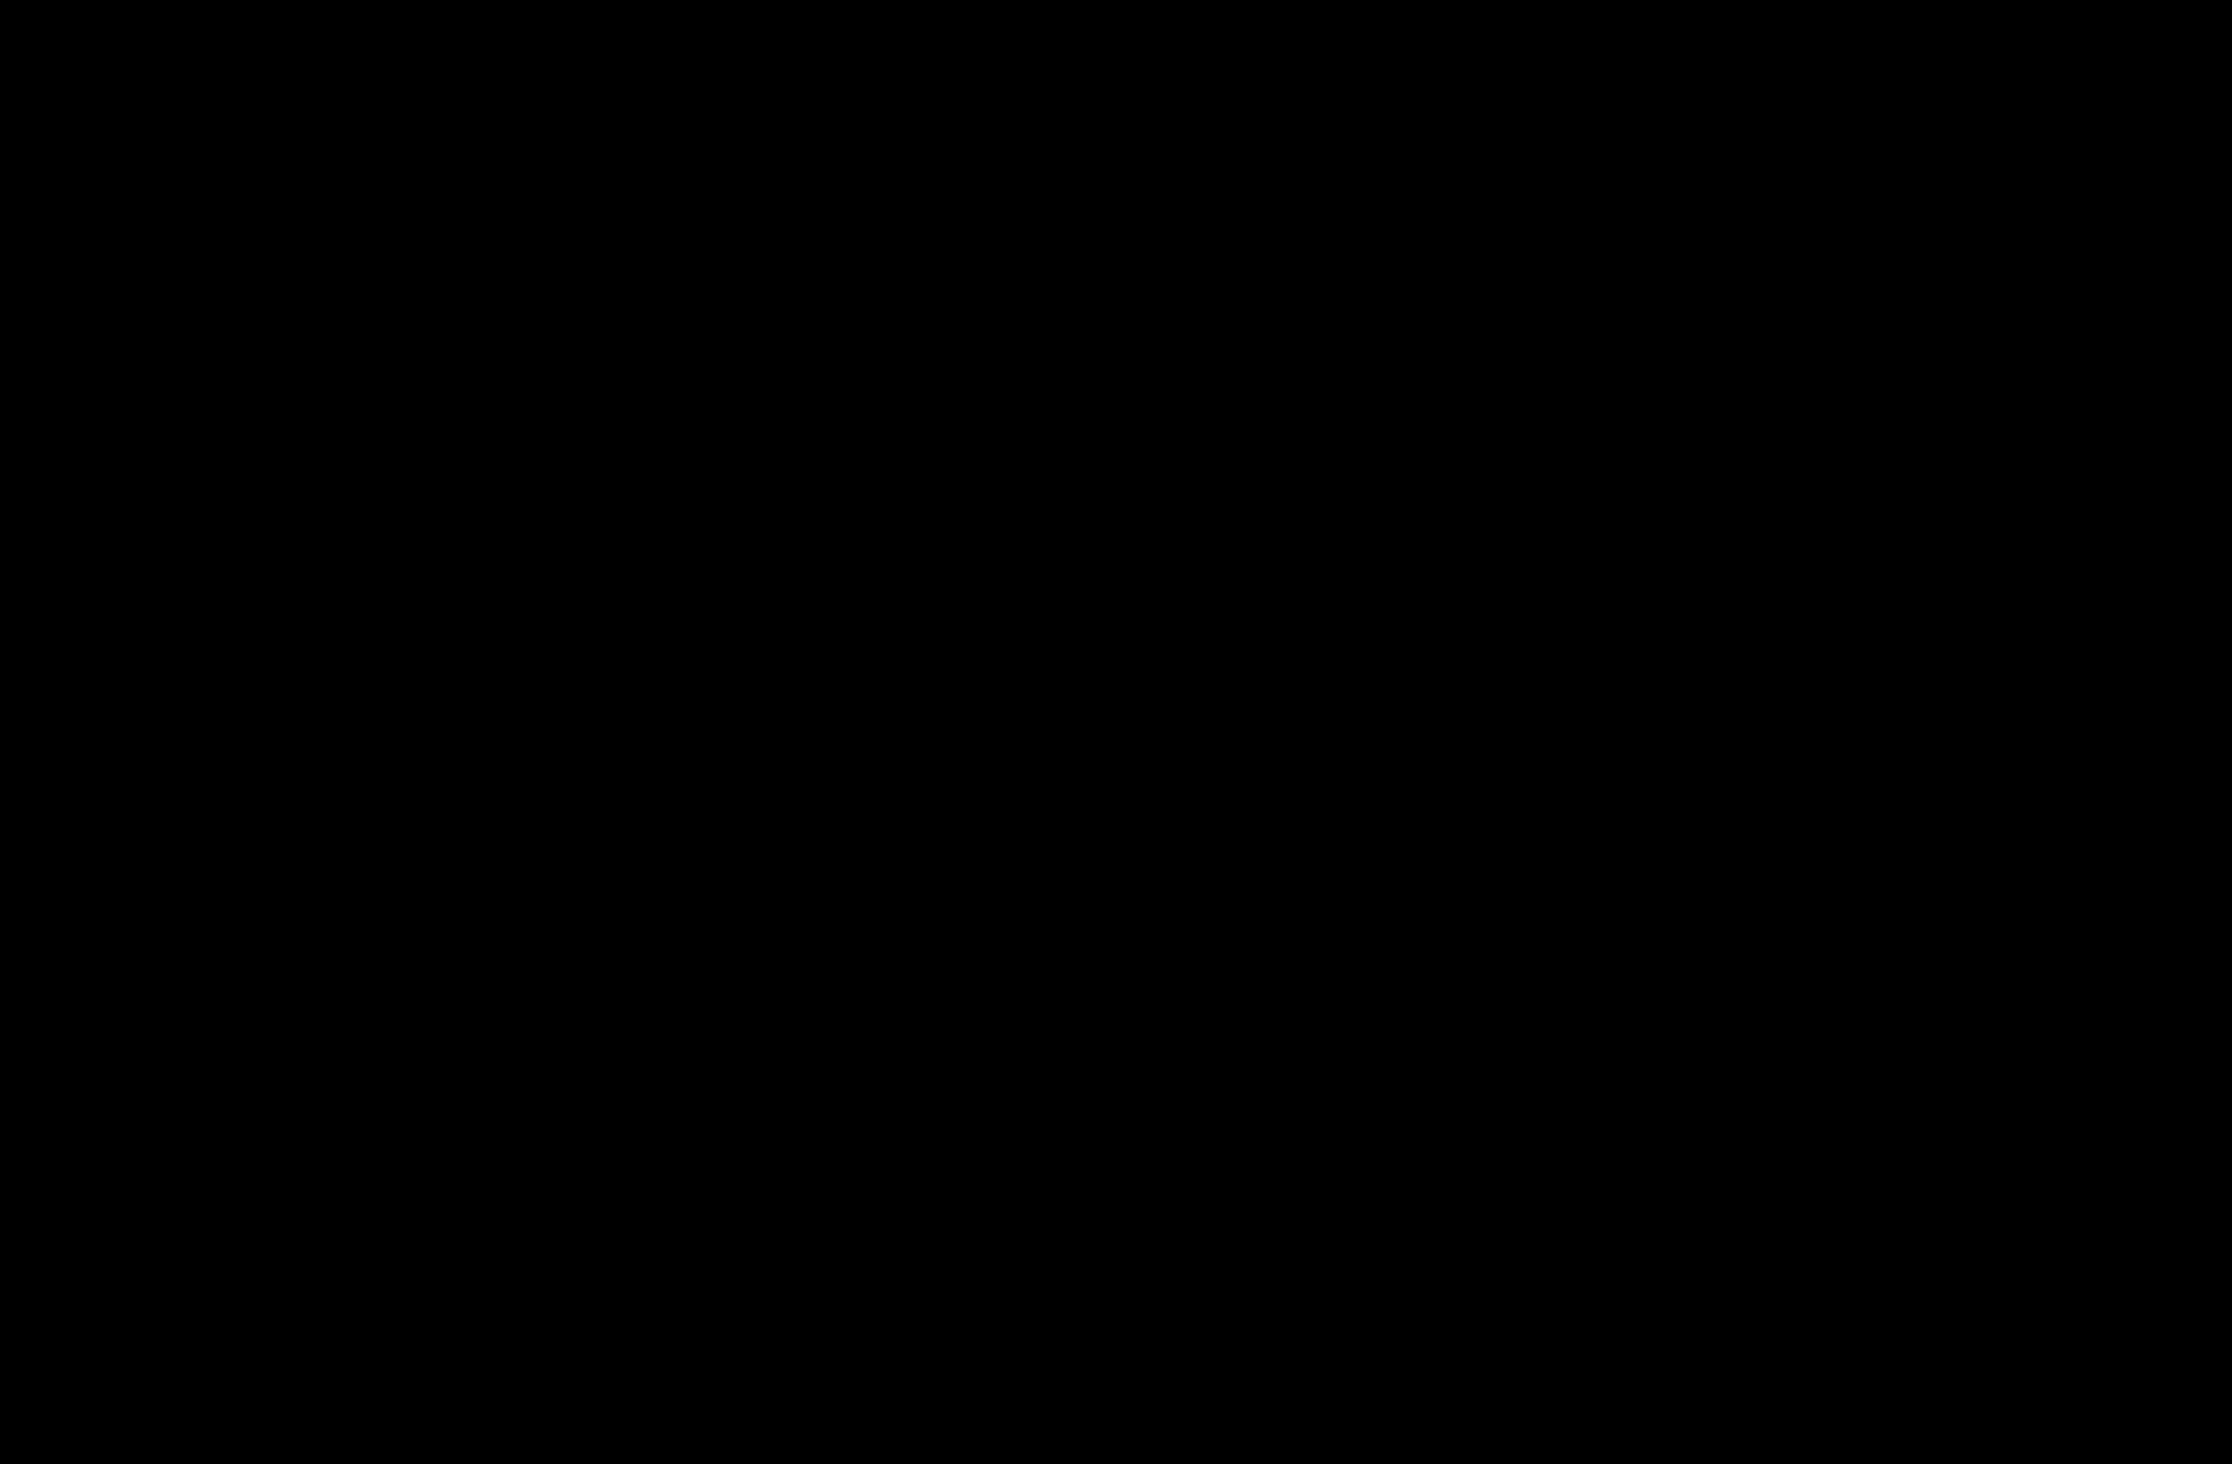 2232x1464 Diver Silhouette Clipart